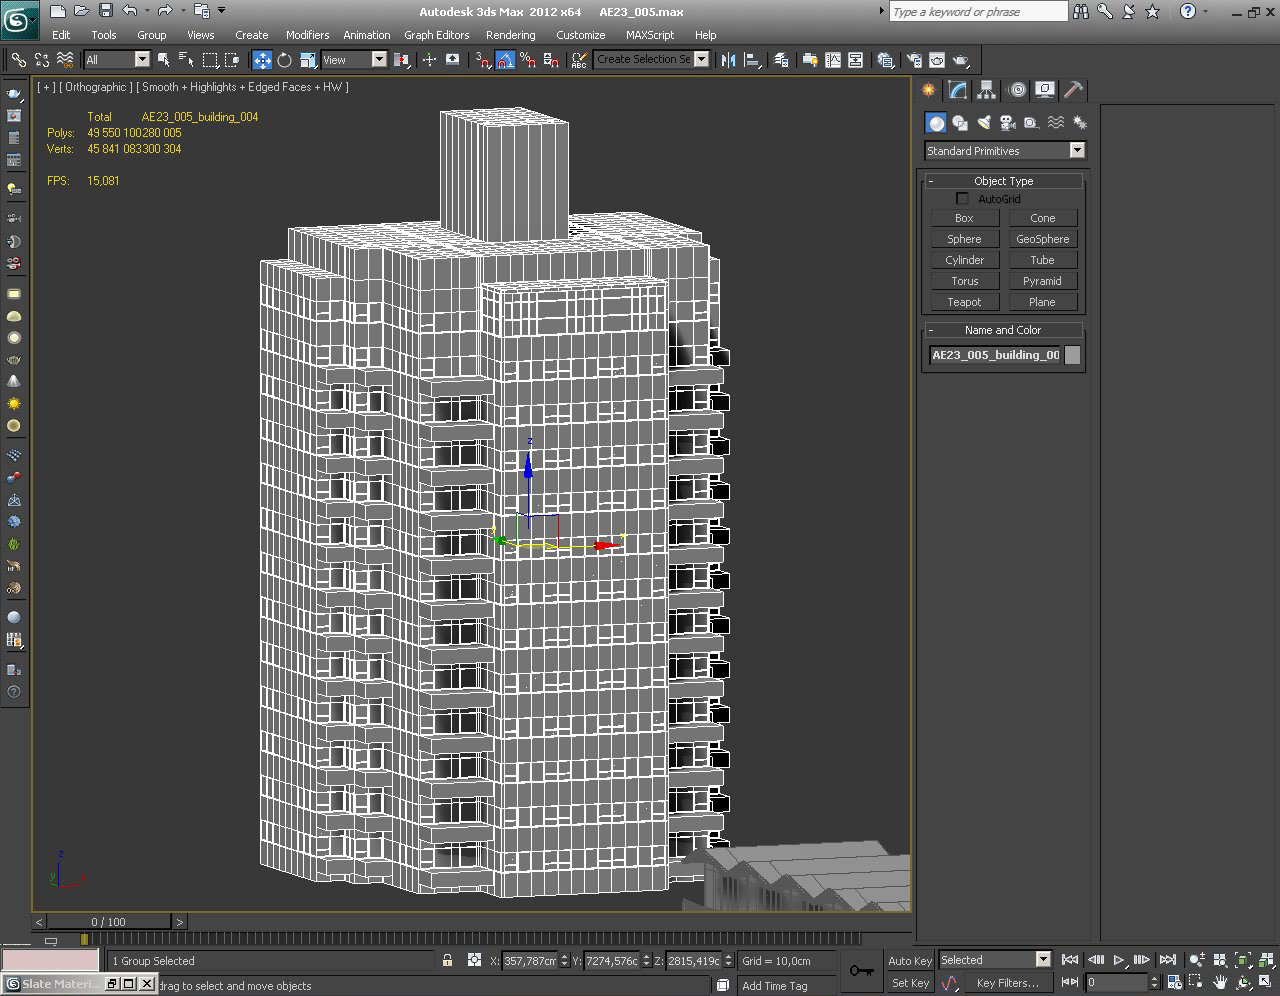 19_ae23_building_ov_2.jpg